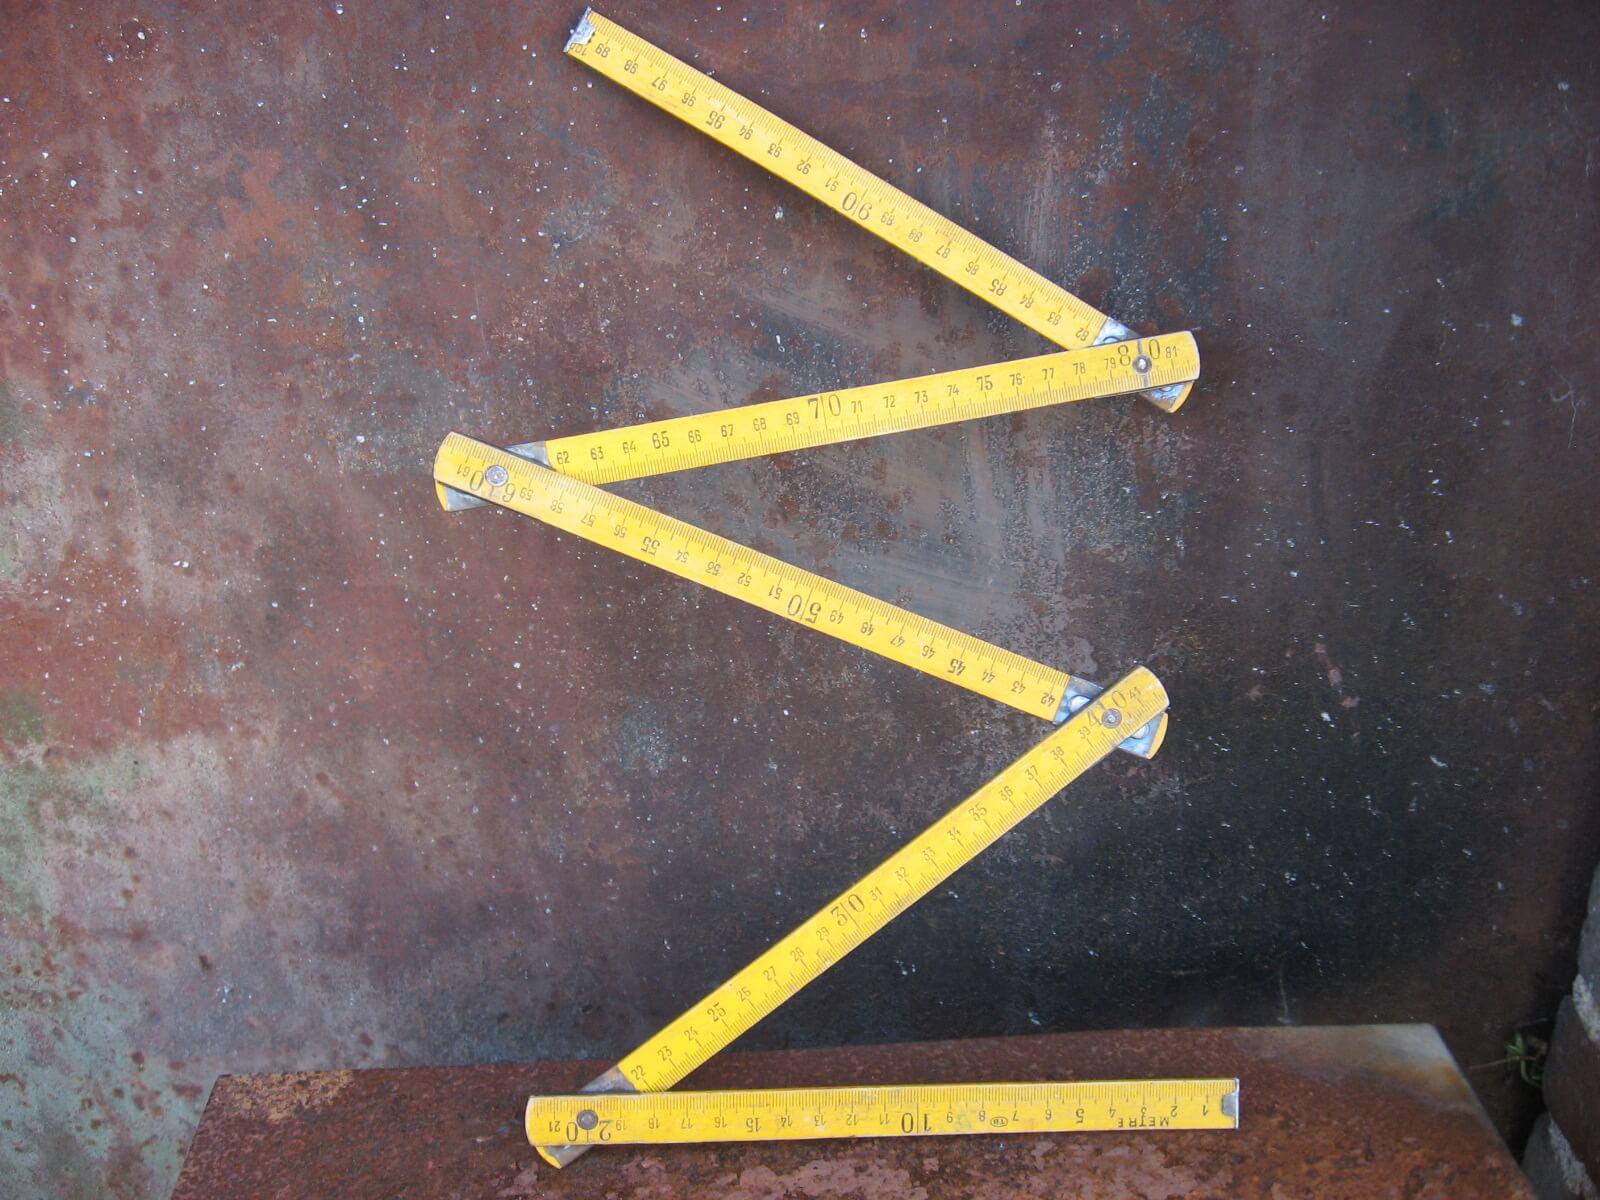 1 metre folding wooden ruler orange at PumpjackPiddlewick